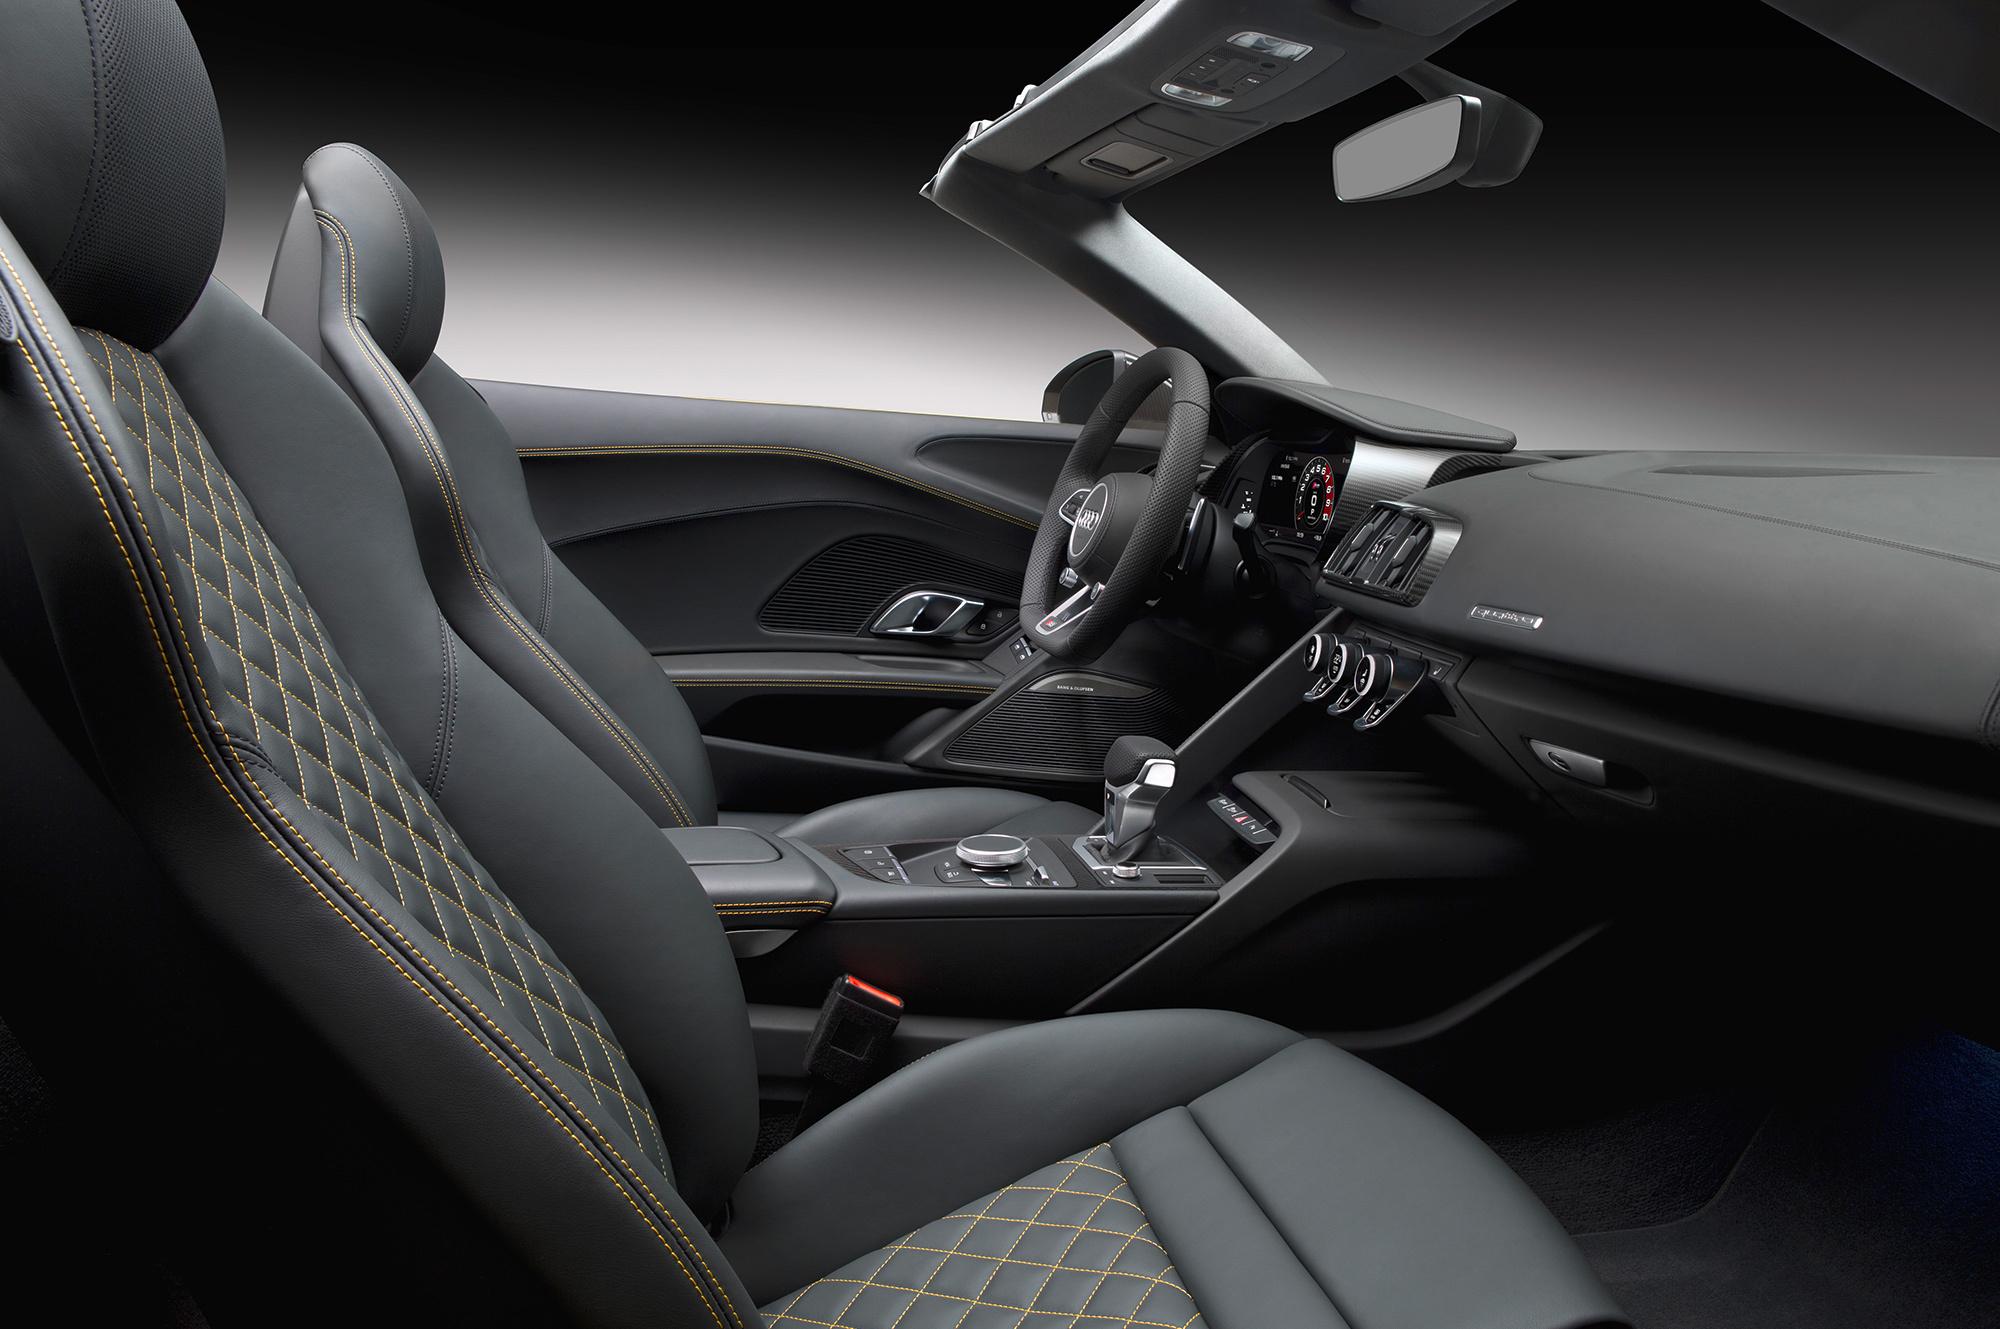 Audi R8 Spyder Wallpapers HQ